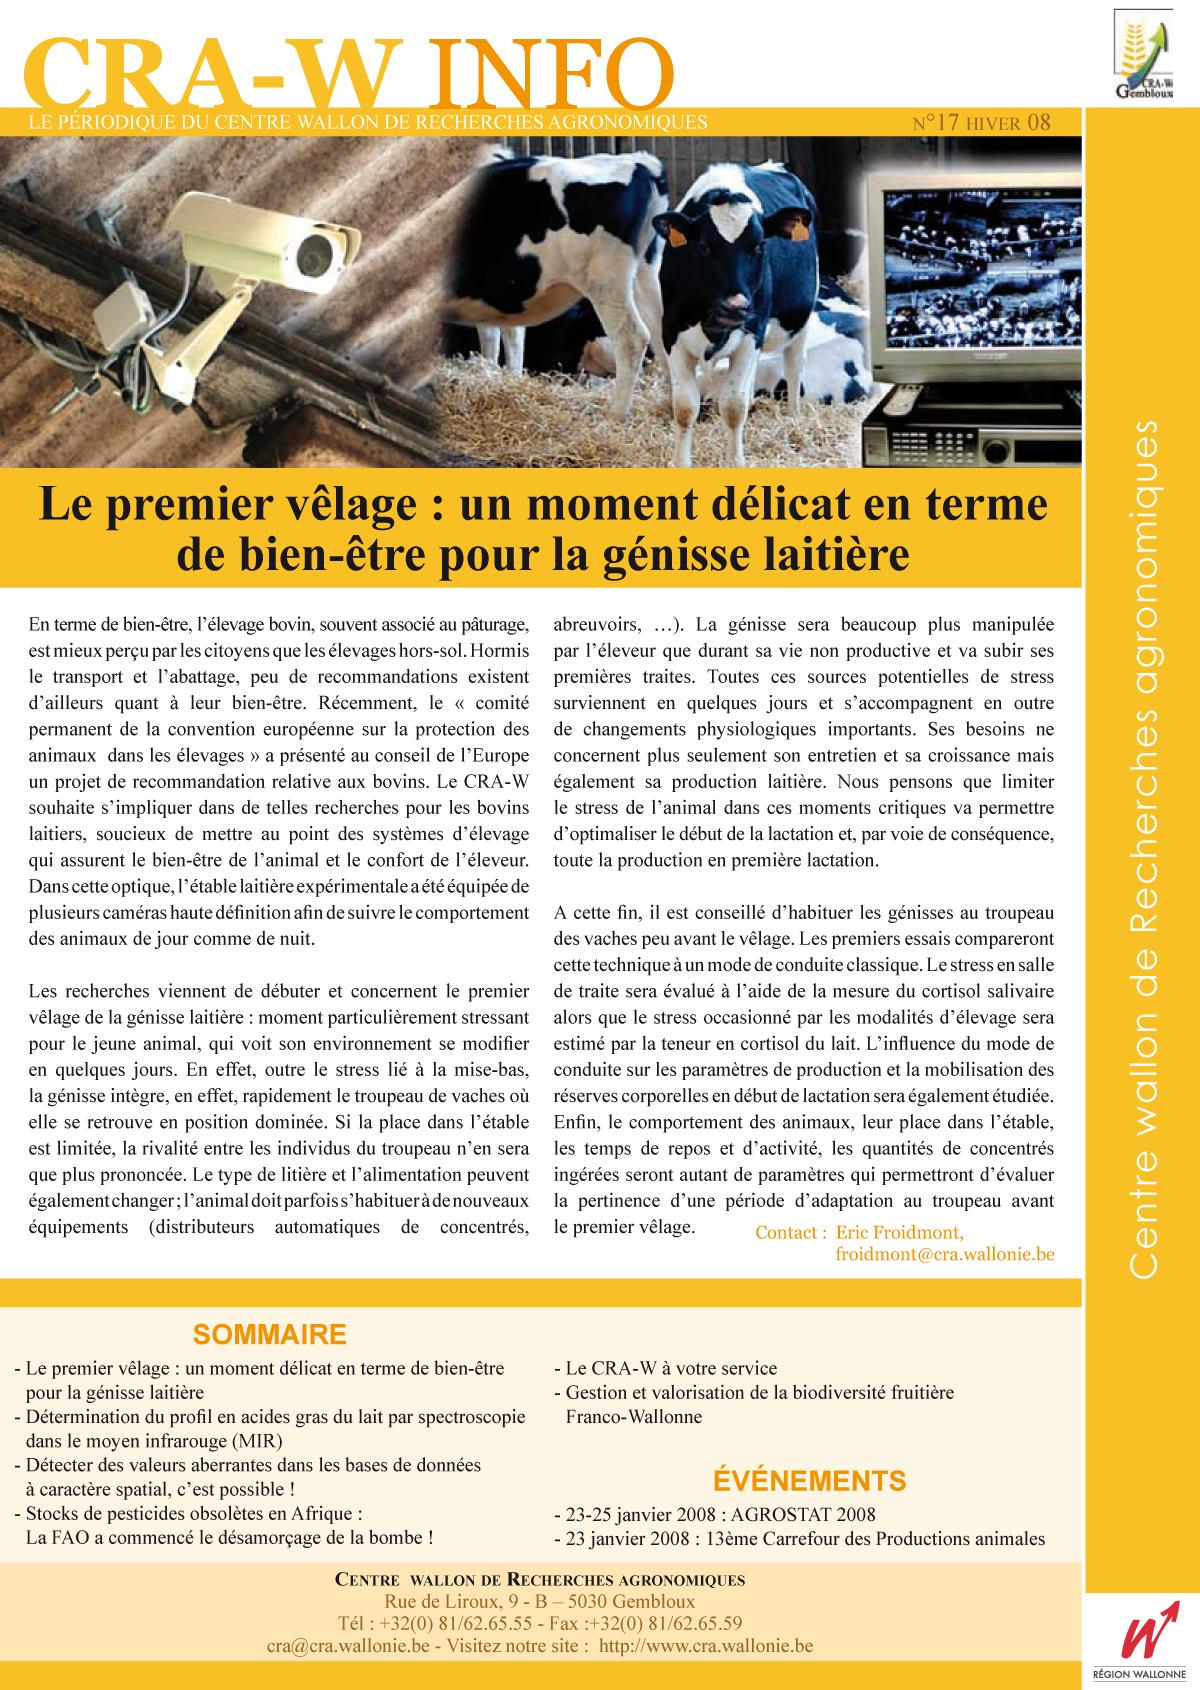 CRAW info n° 17